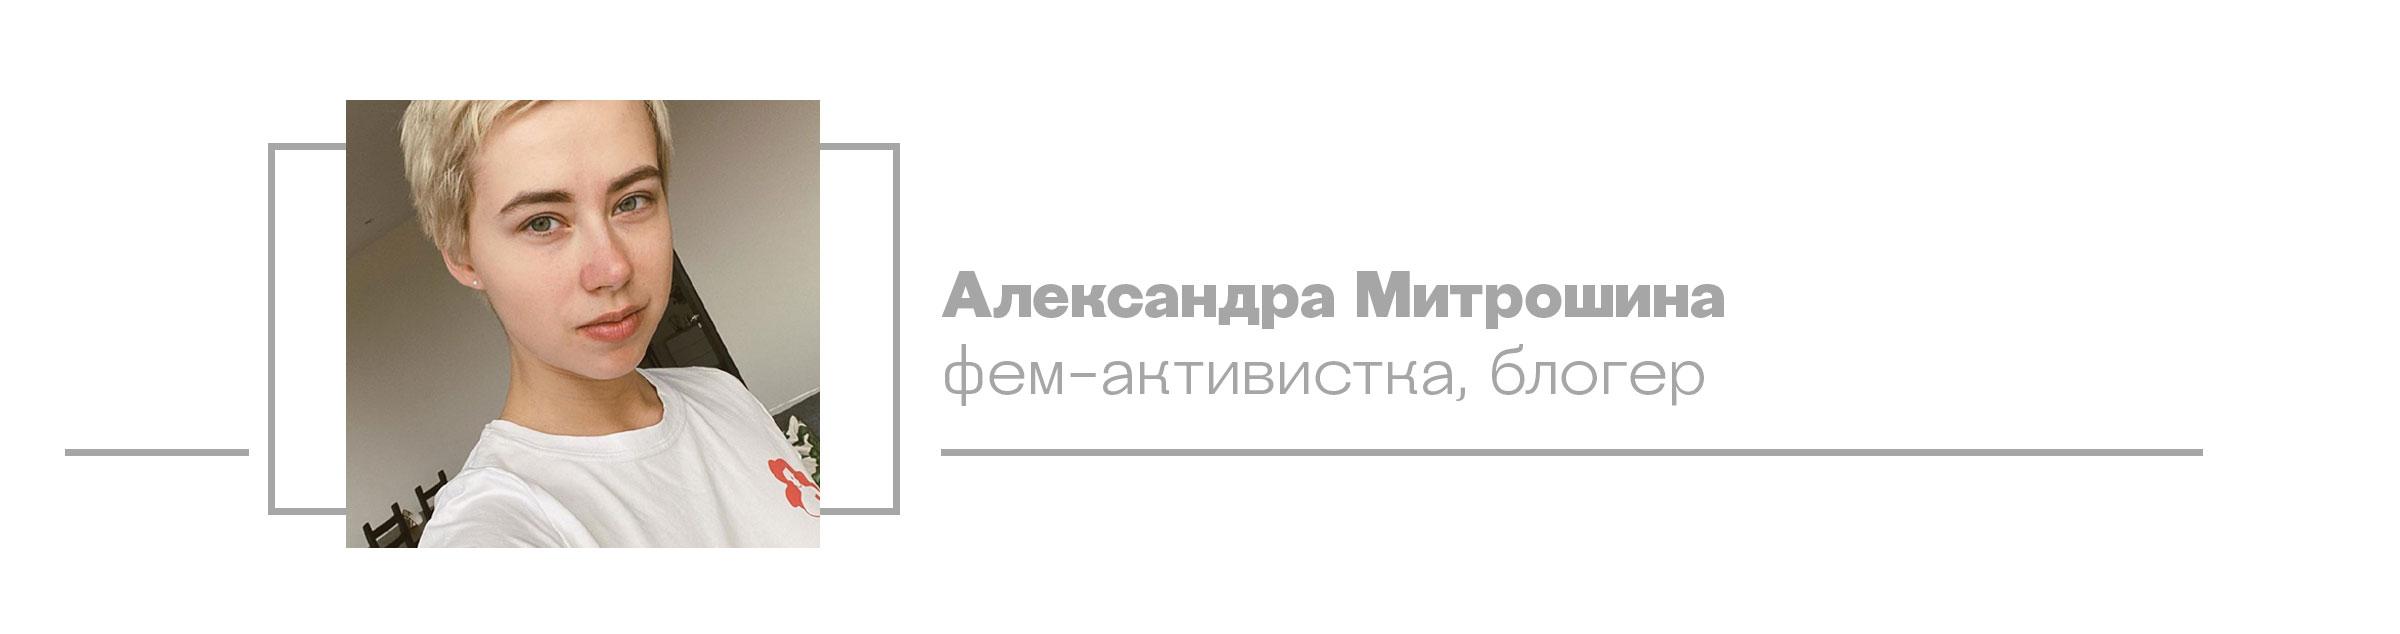 Александра Митрошина, фем-активистка, блогер